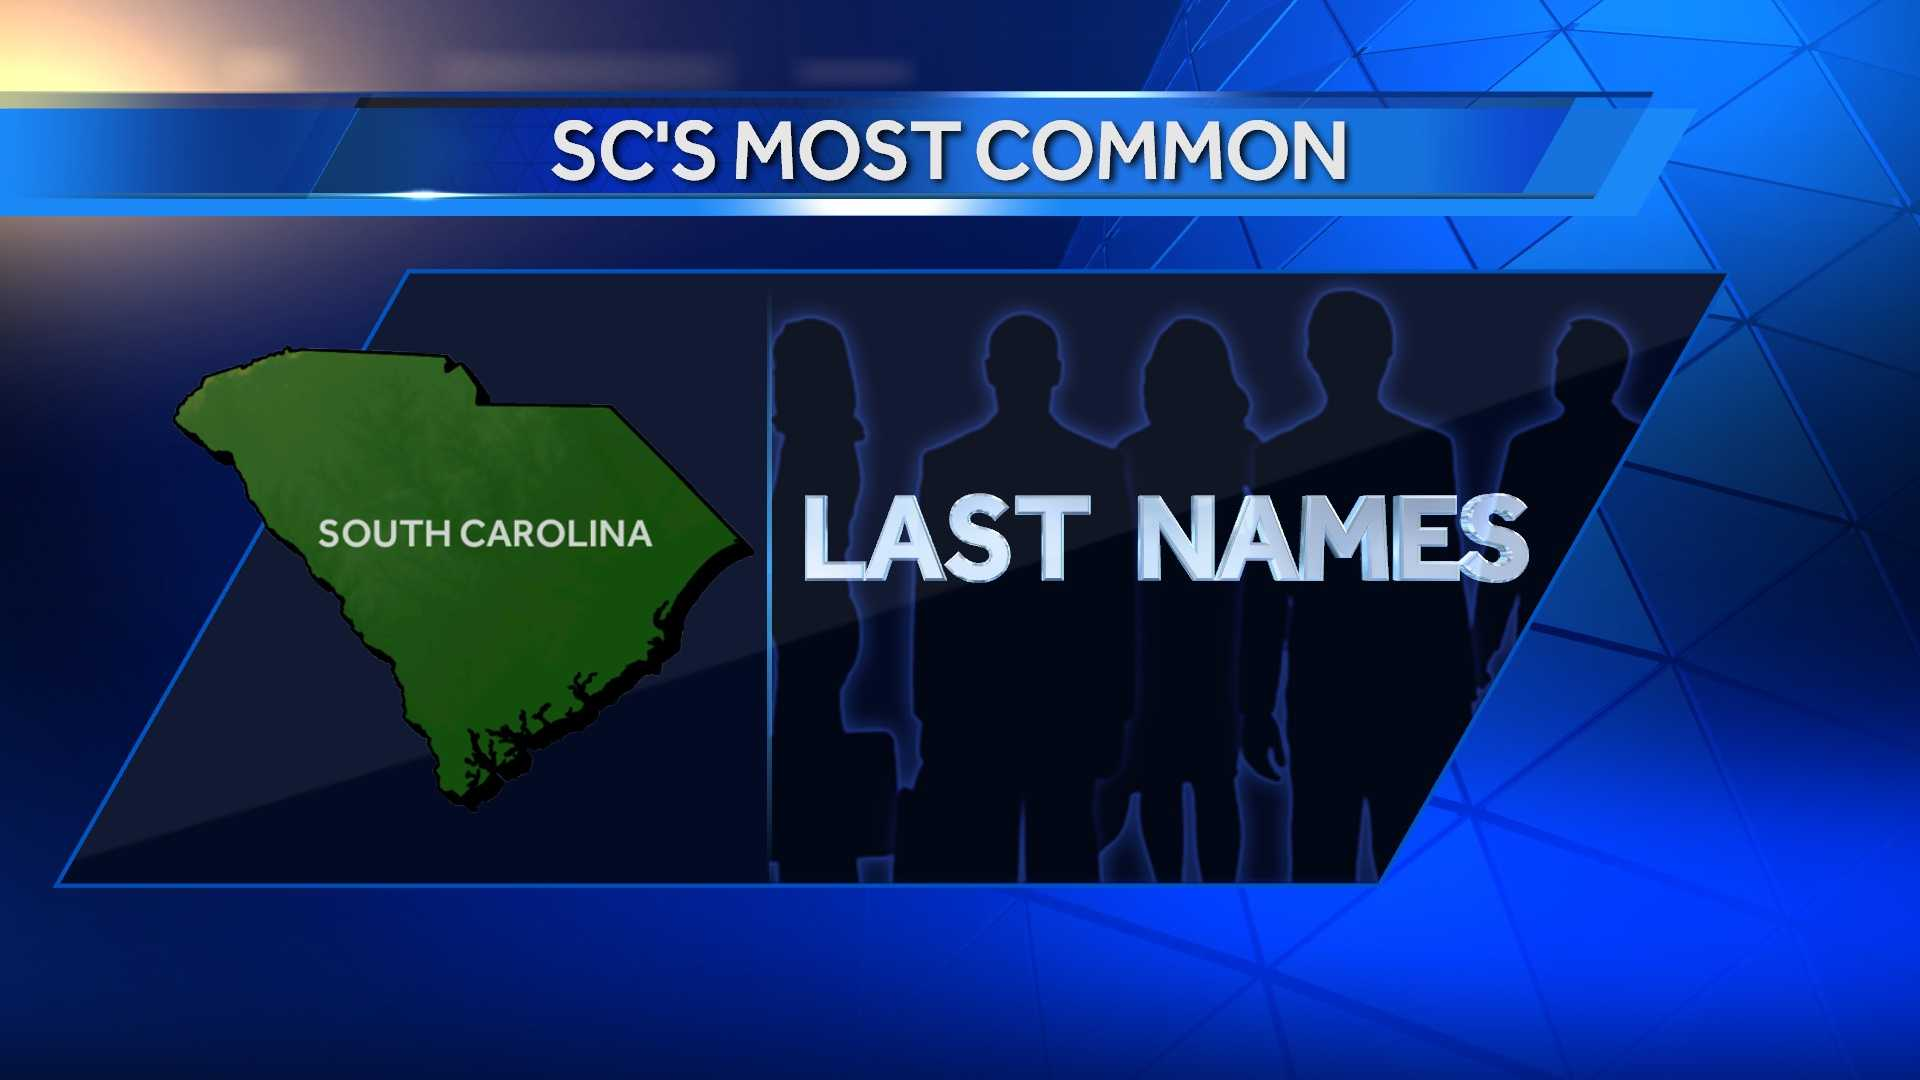 most commo last names blurb